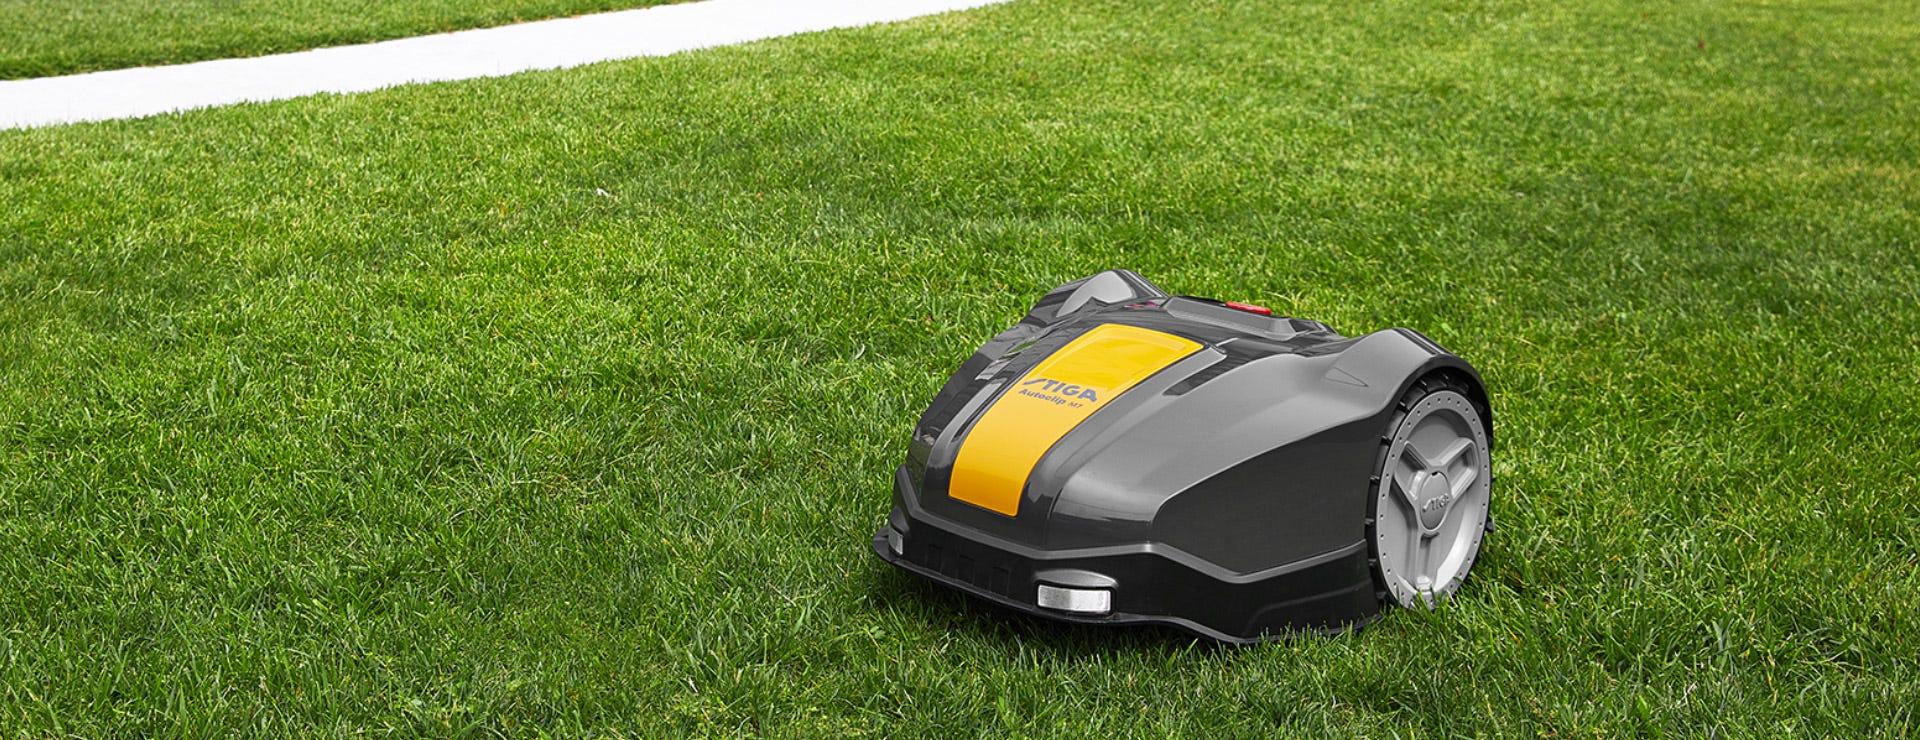 autoclip-m series-robotmaaier